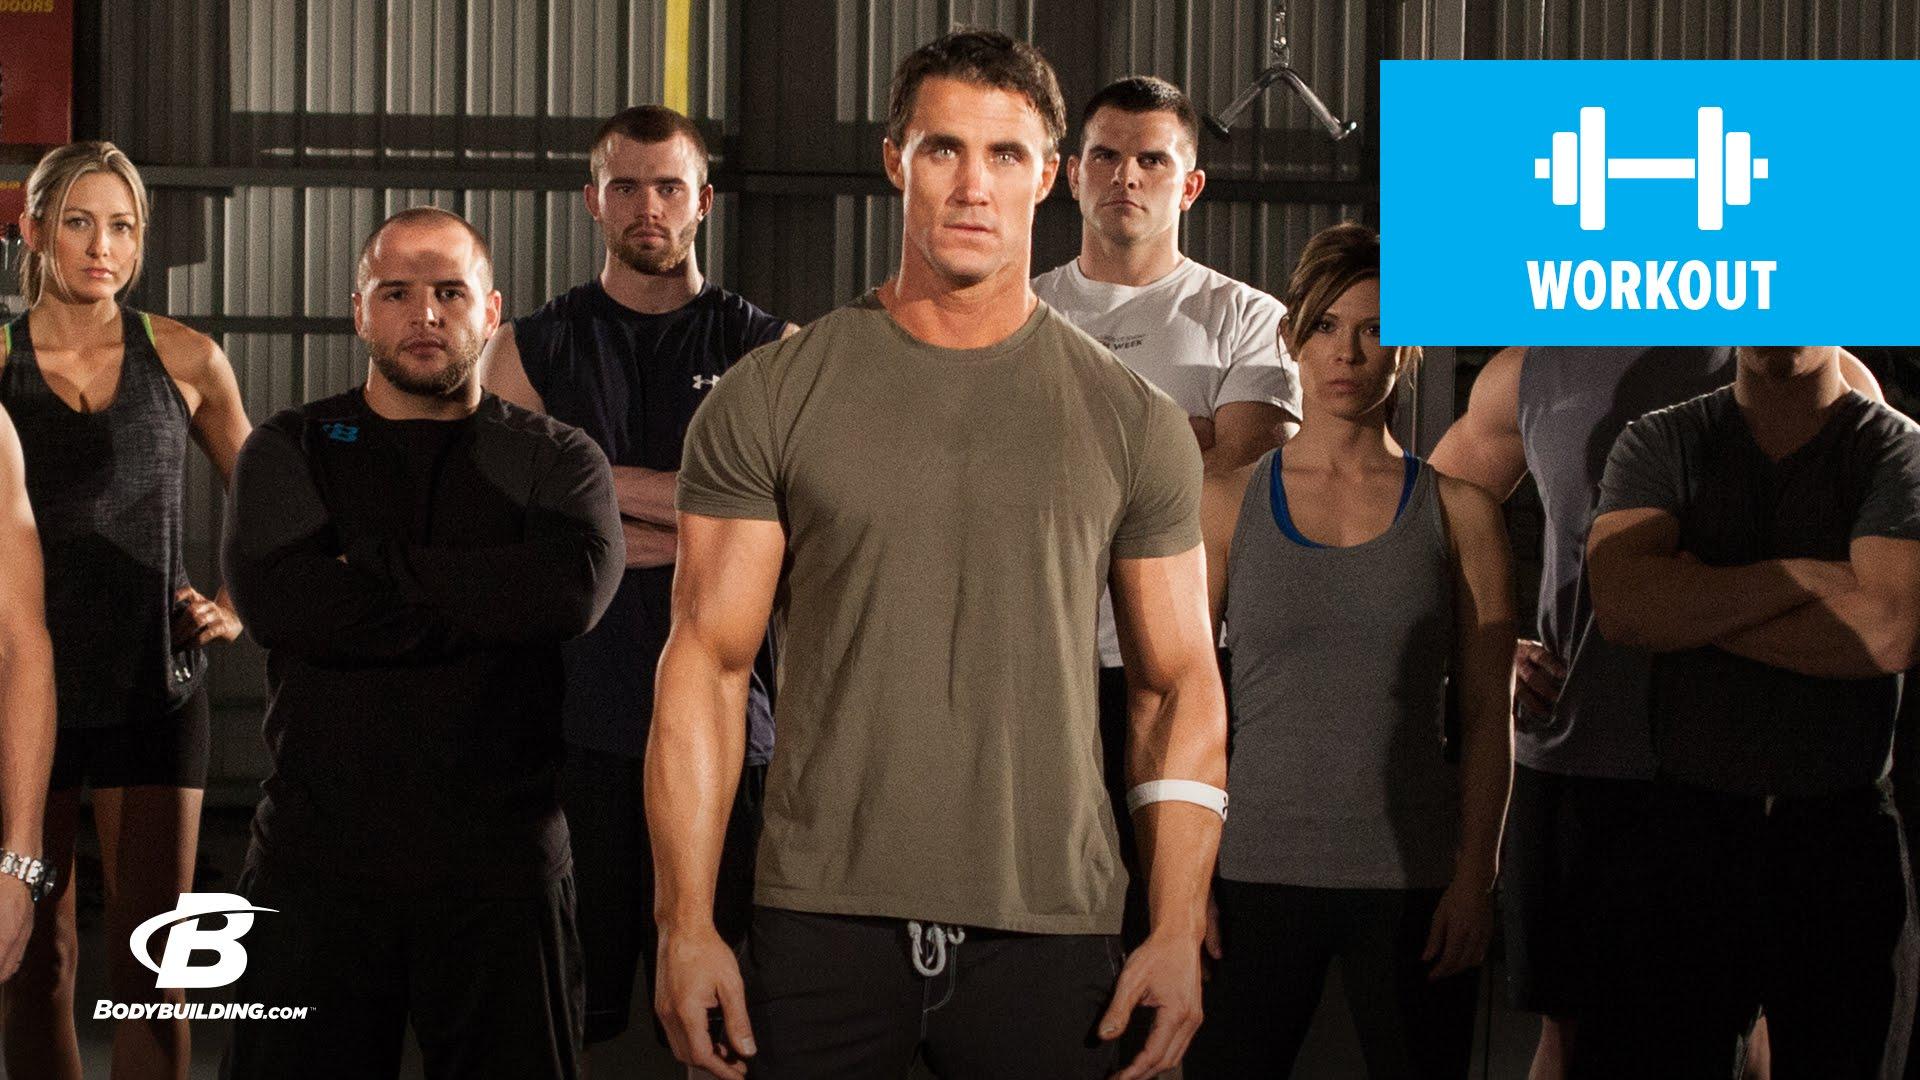 Exercice du sport en Vidéos : Program Overview | MFT28: Greg